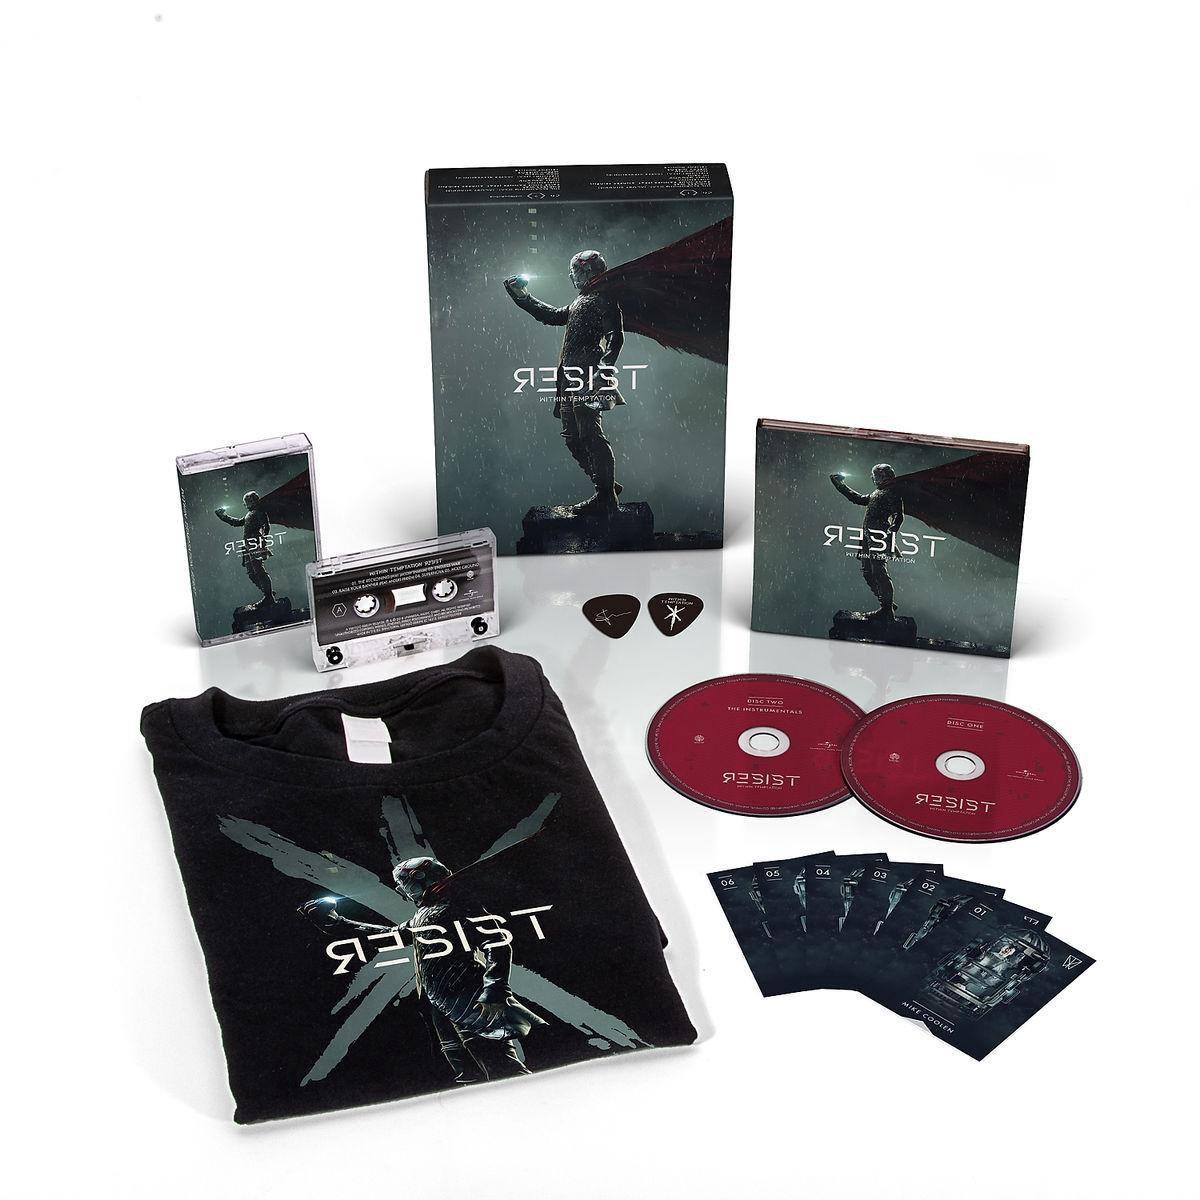 Resist (Limited Boxset + T-Shirt M) - Within Temptation